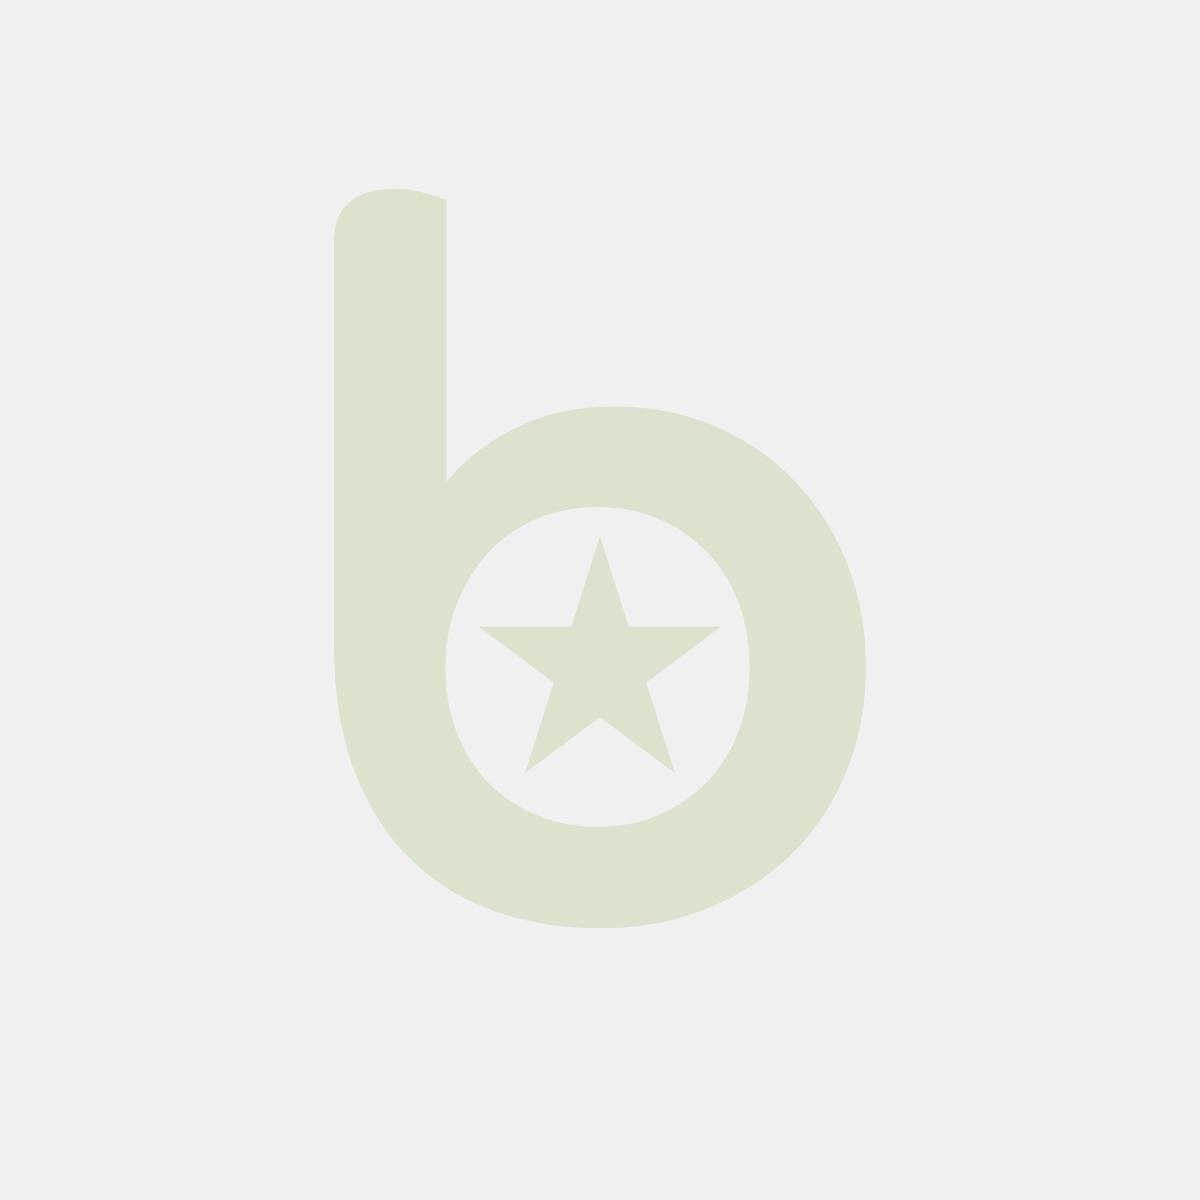 Rondel Profi Line Bez Pokrywki 1,5 L; Śr. 160 X 75 H